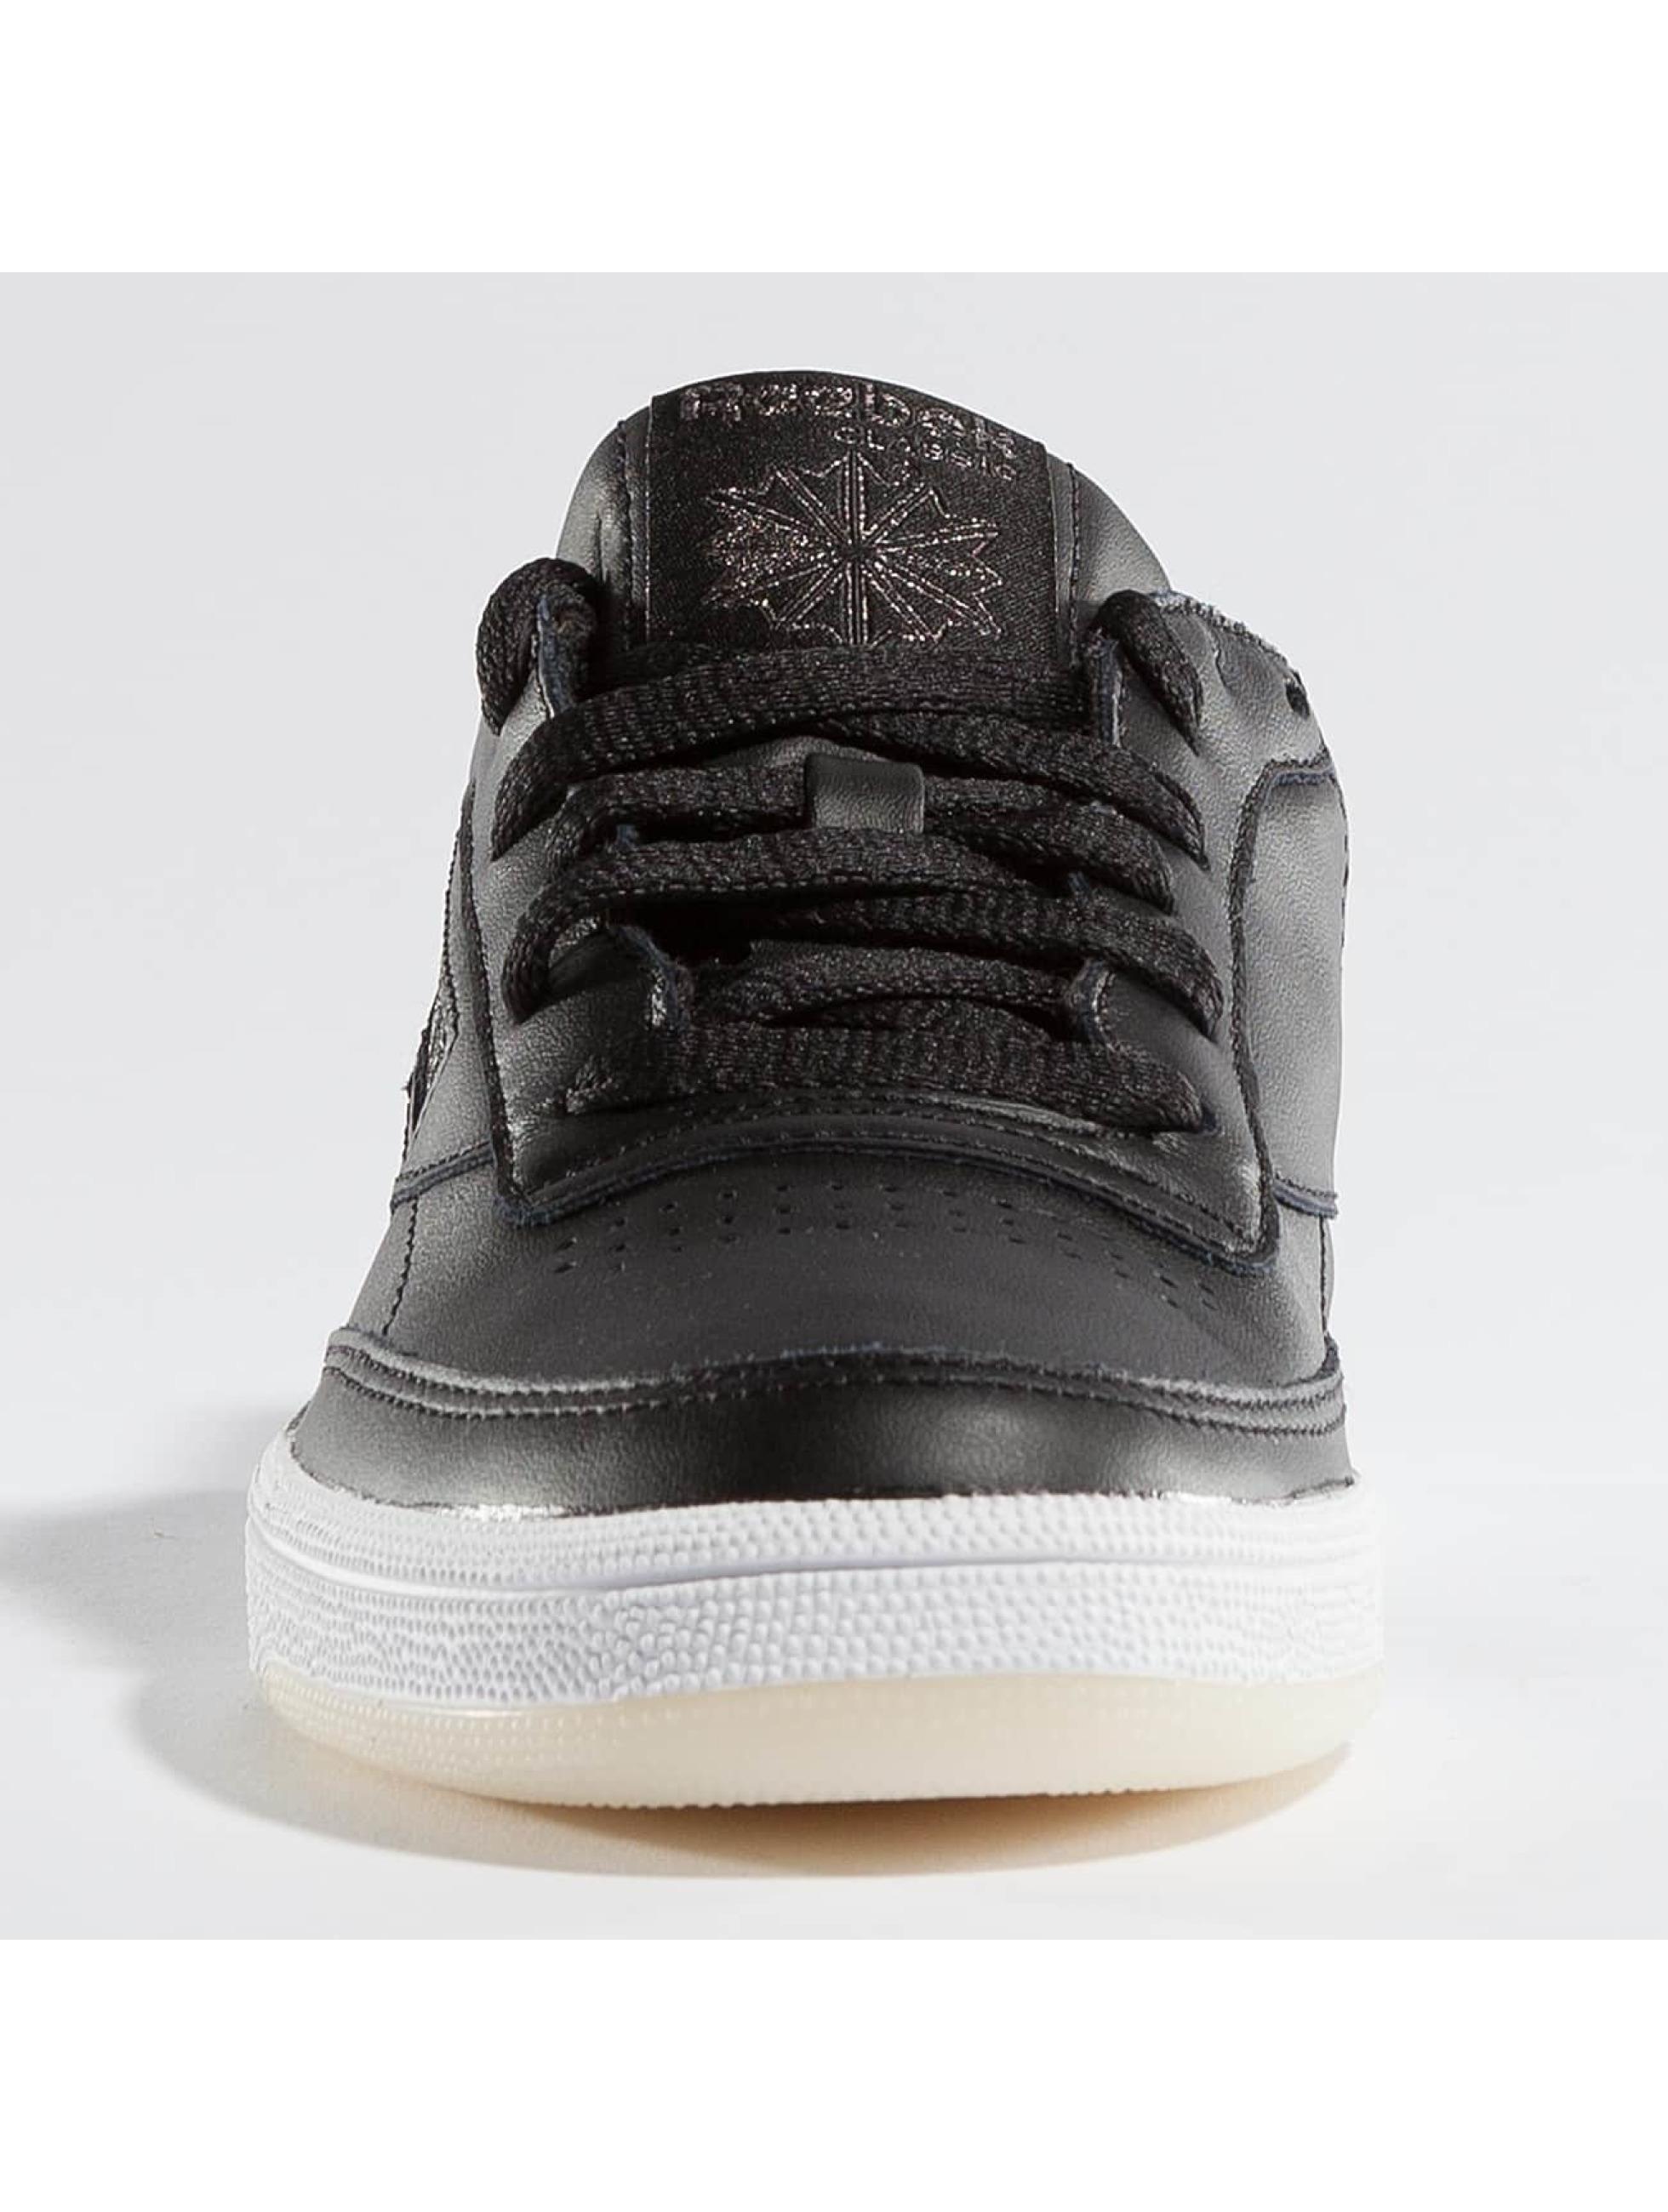 Reebok Sneaker Club C 85 Leather schwarz